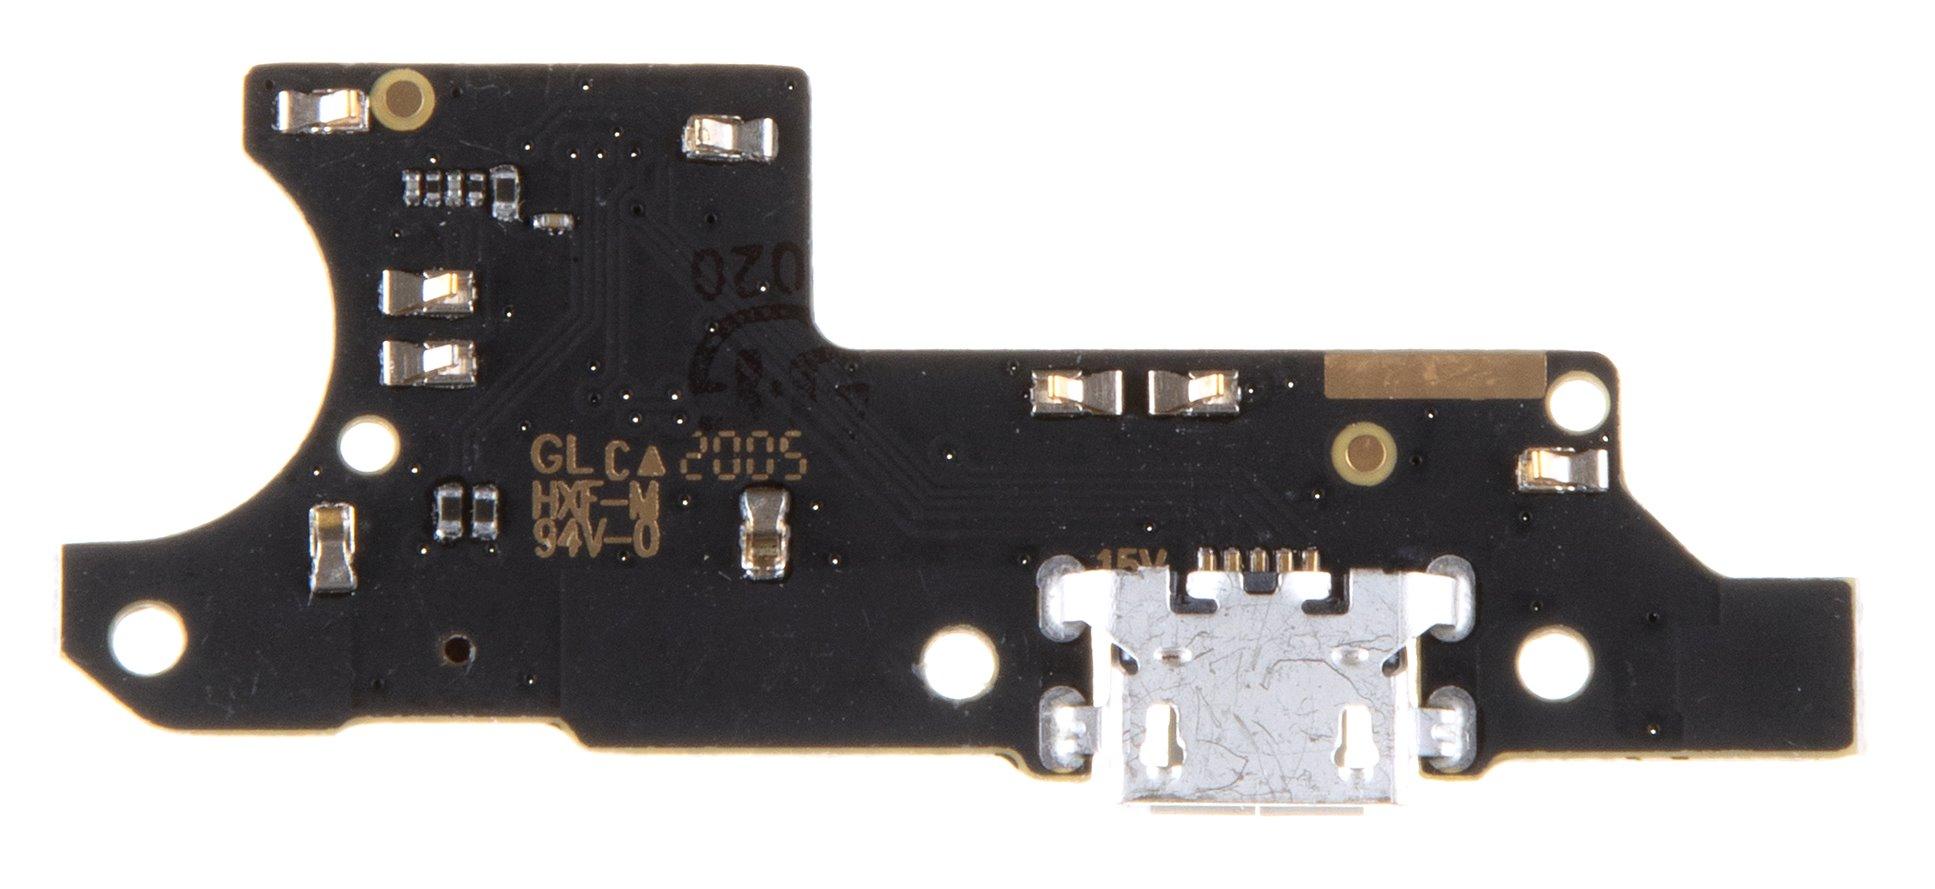 Motorola G8 Power Lite Deska vč. Dobíjecího Konektoru